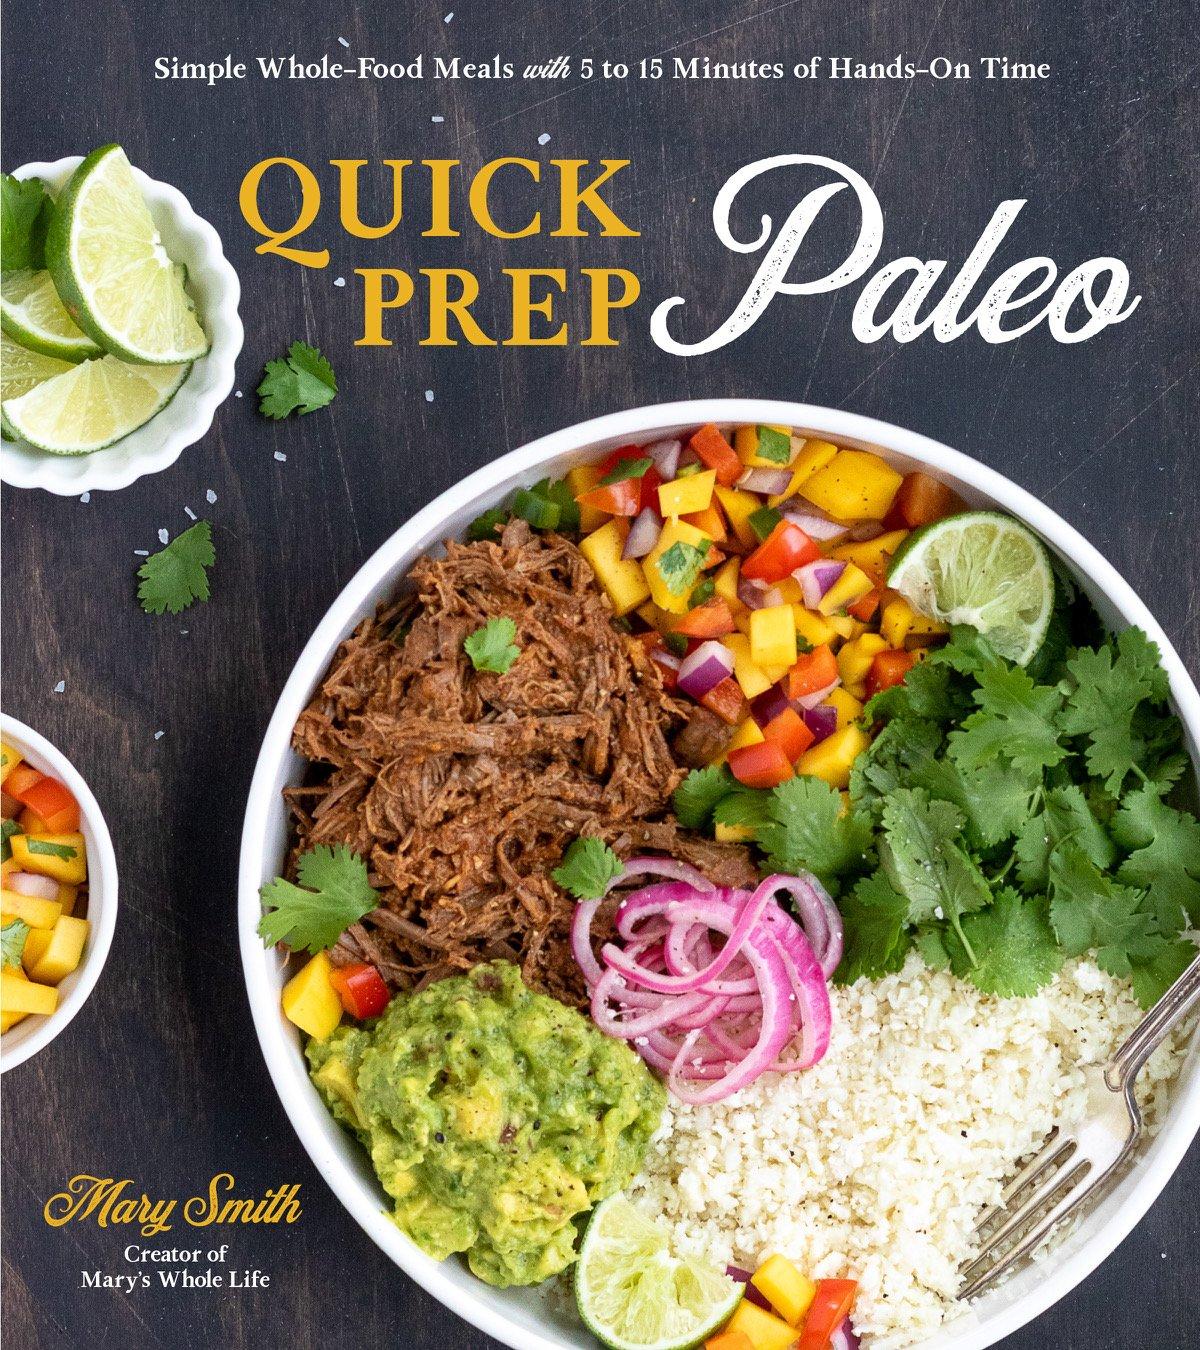 Quick Prep Paleo Cookbook